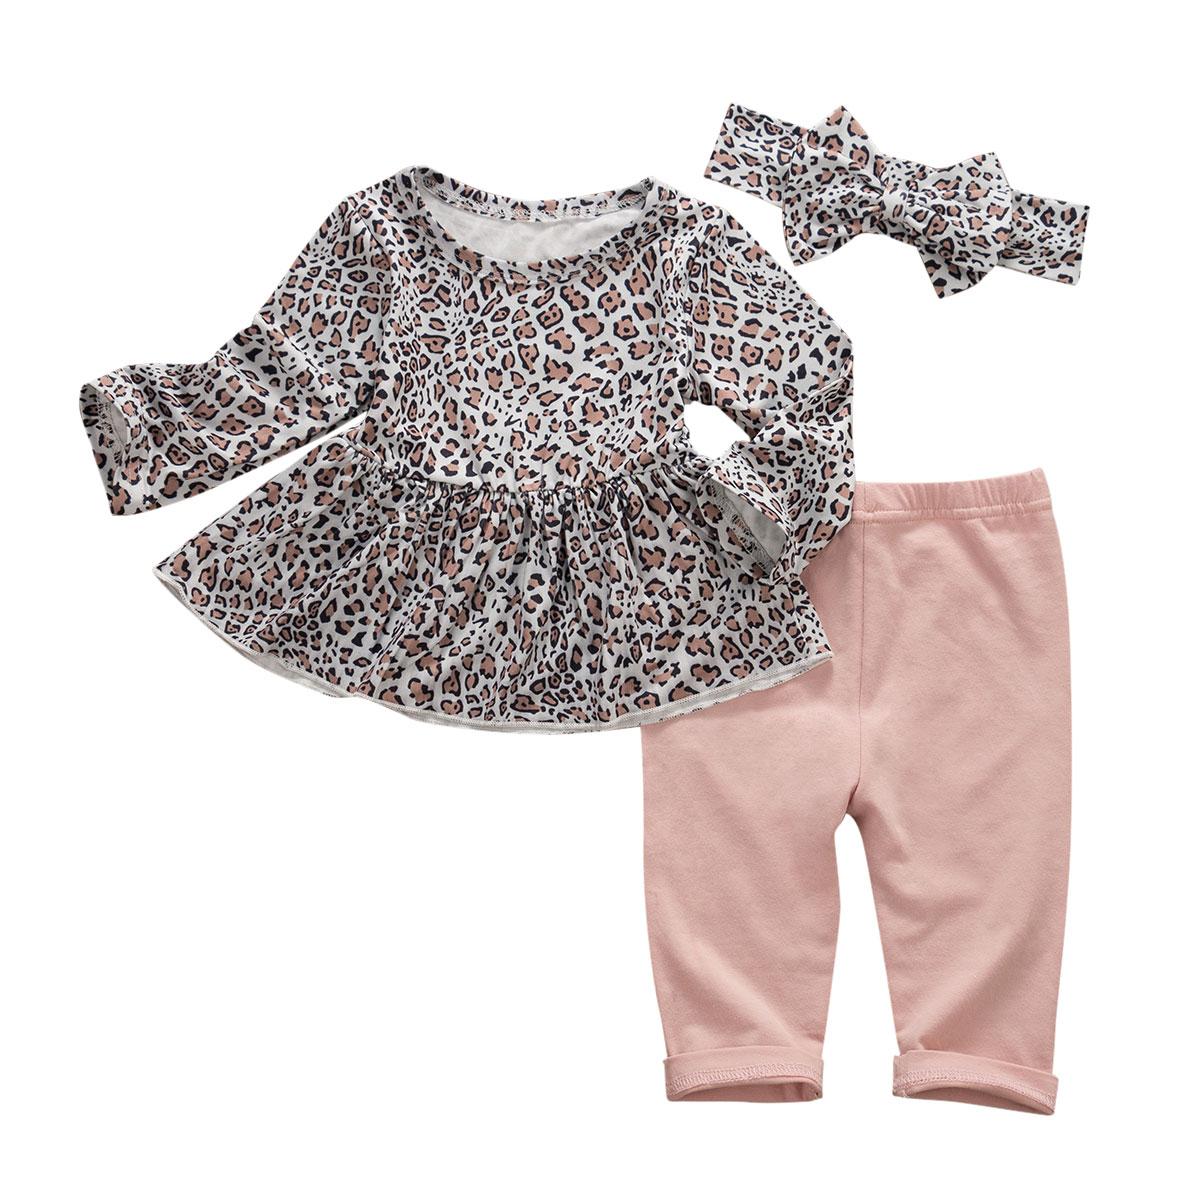 Mode Kleinkind Baby Mädchen Kleidung Langarm T-shirt Top Leggings Hosen Outfit